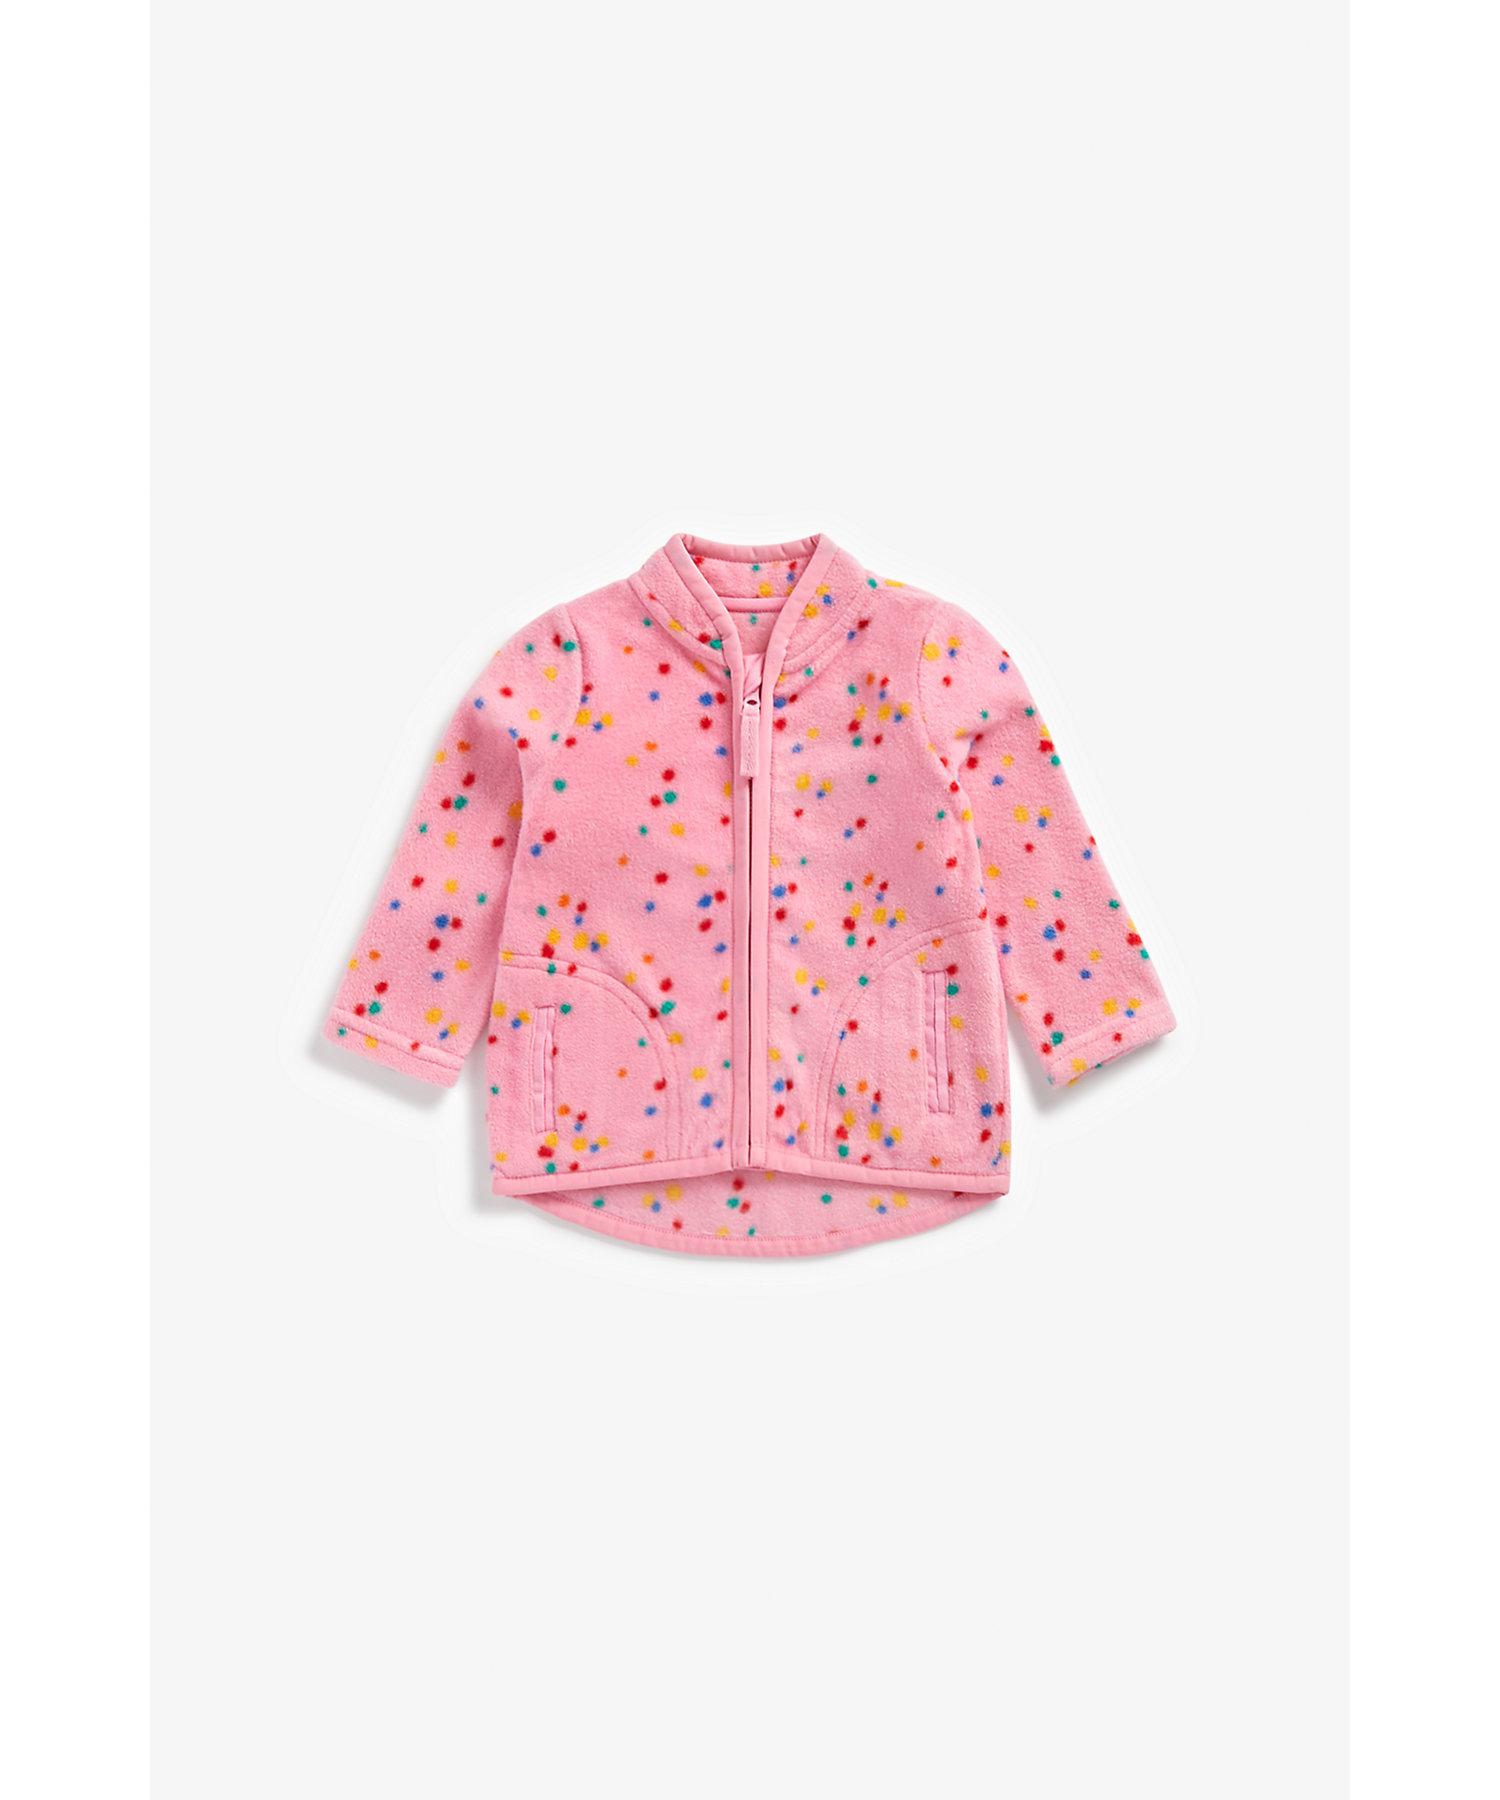 Mothercare | Girls Full Sleeves Fleece Jacket Spot Print - Pink